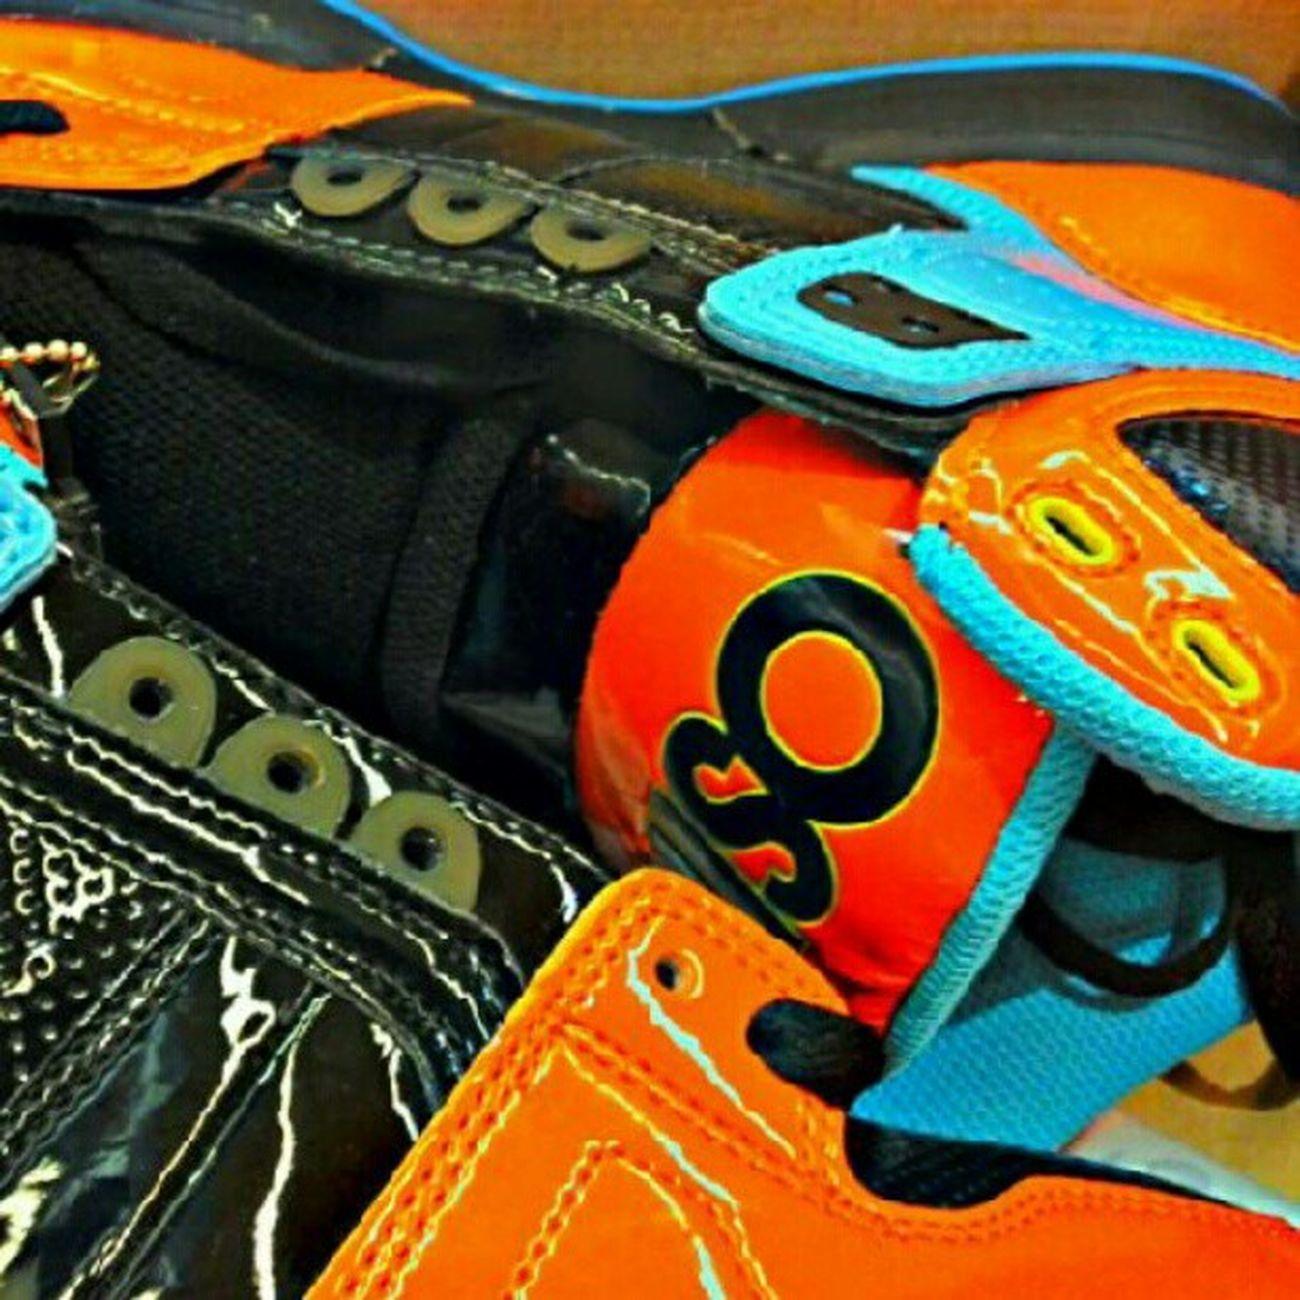 Osiris Pumpkin Orange & Black halloween shoes